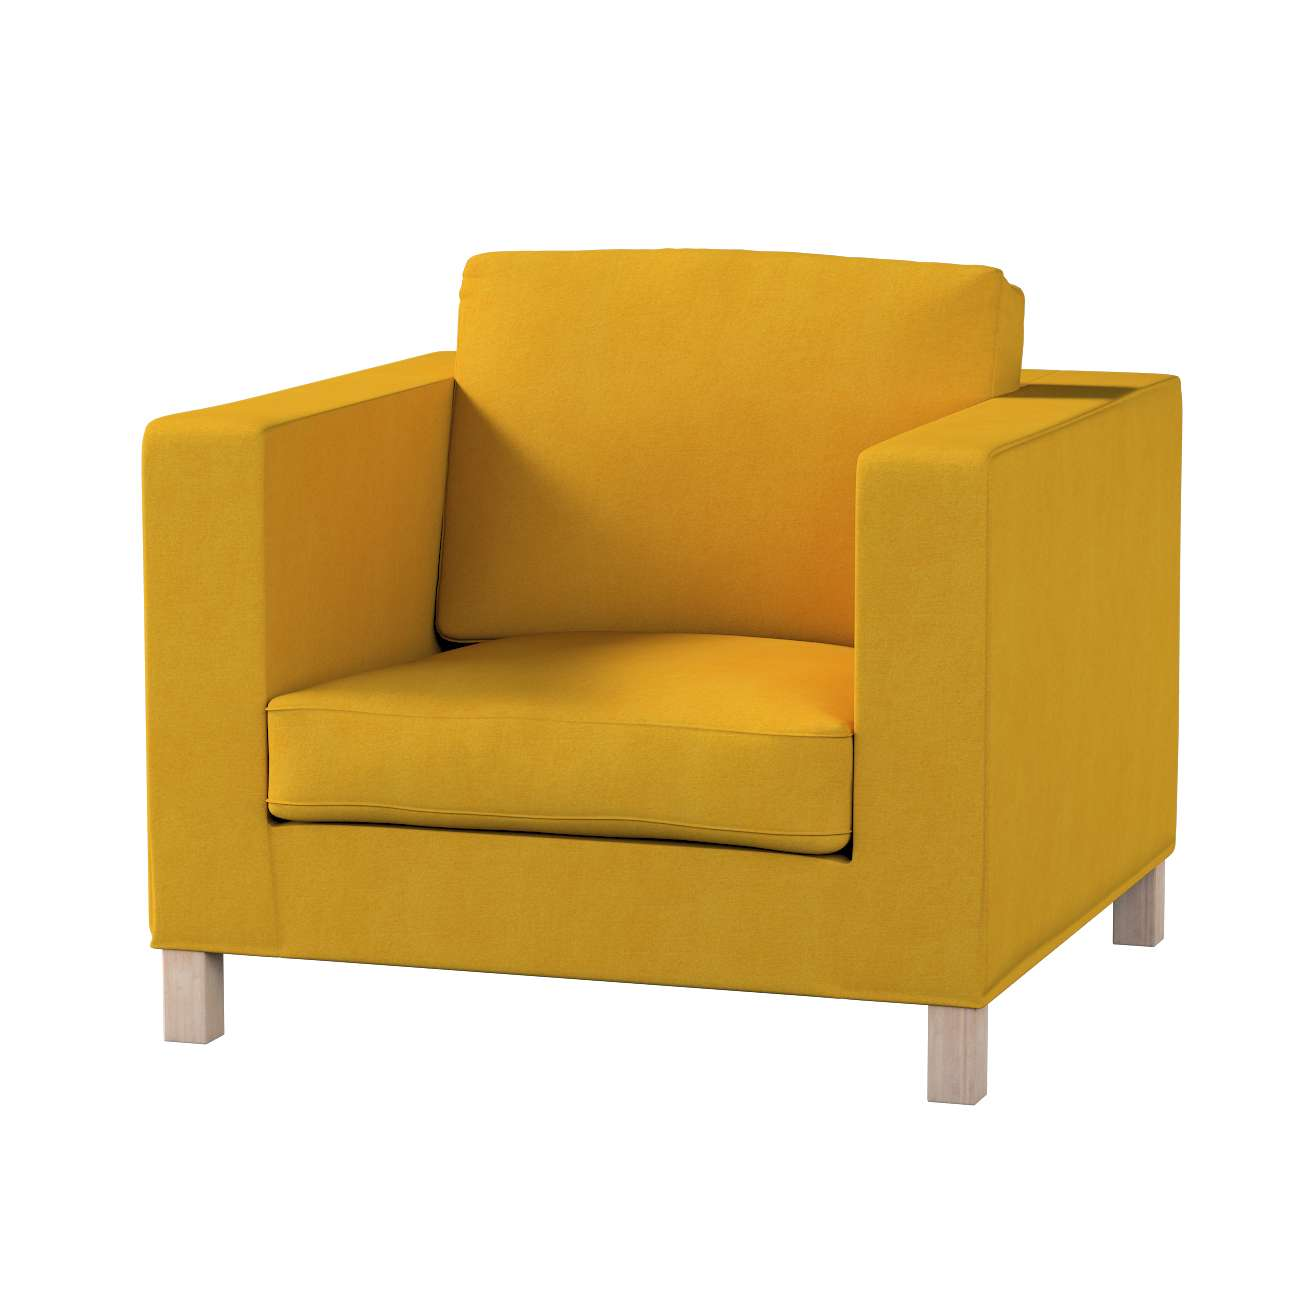 Pokrowiec na fotel Karlanda, krótki fotel Karlanda w kolekcji Etna , tkanina: 705-04